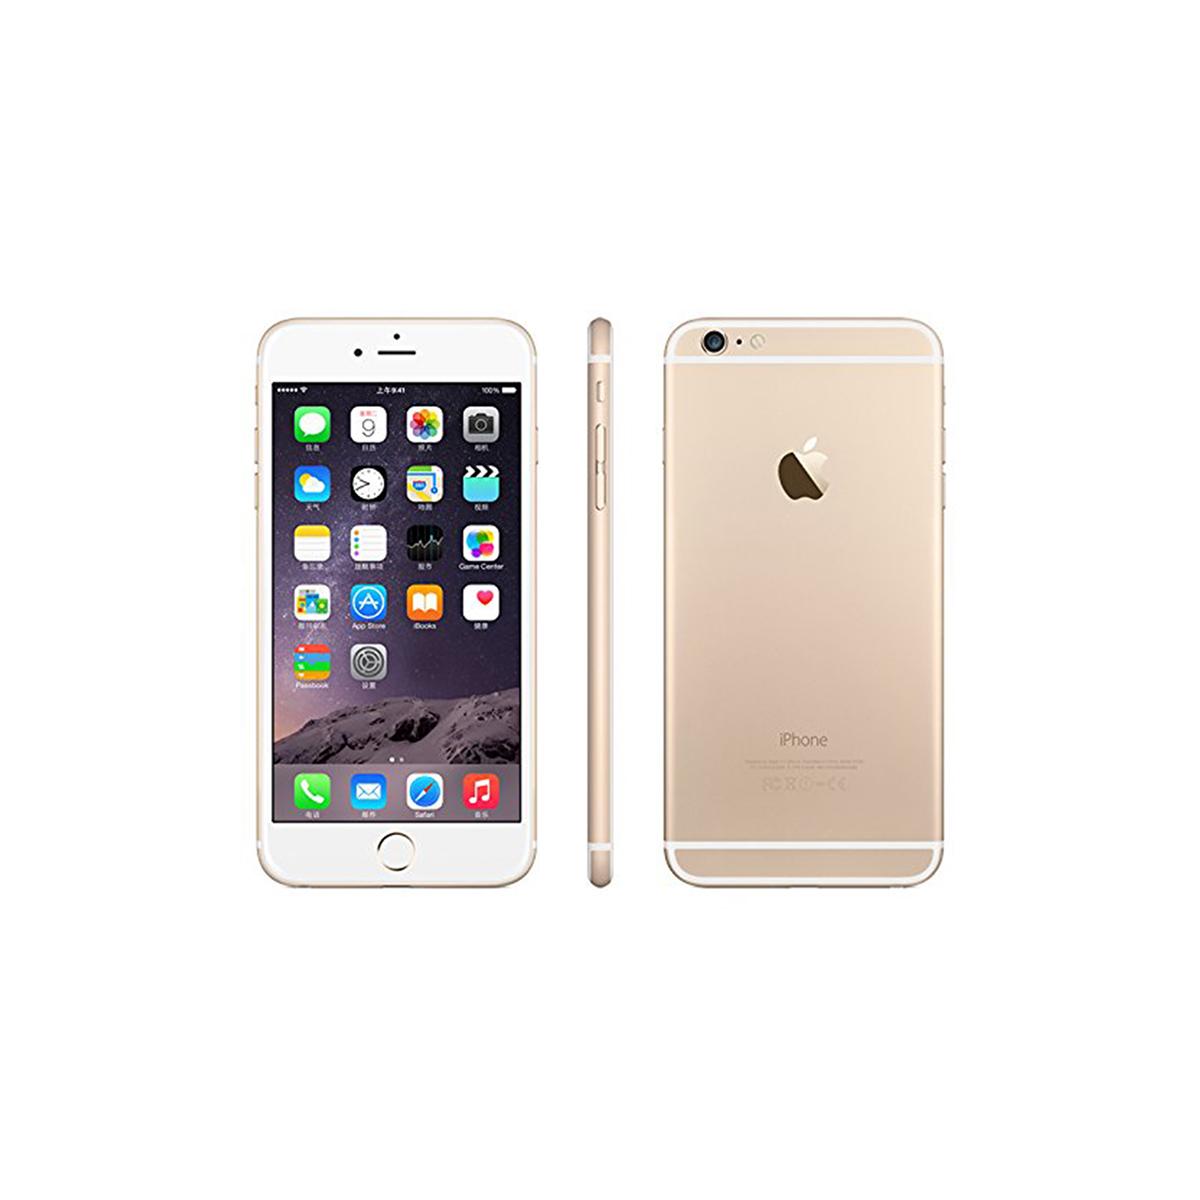 c0990717307 Nutibaas – Apple iPhone (iPhone 4, iPhone 4S, iPhone 5, iPhone 5S ...